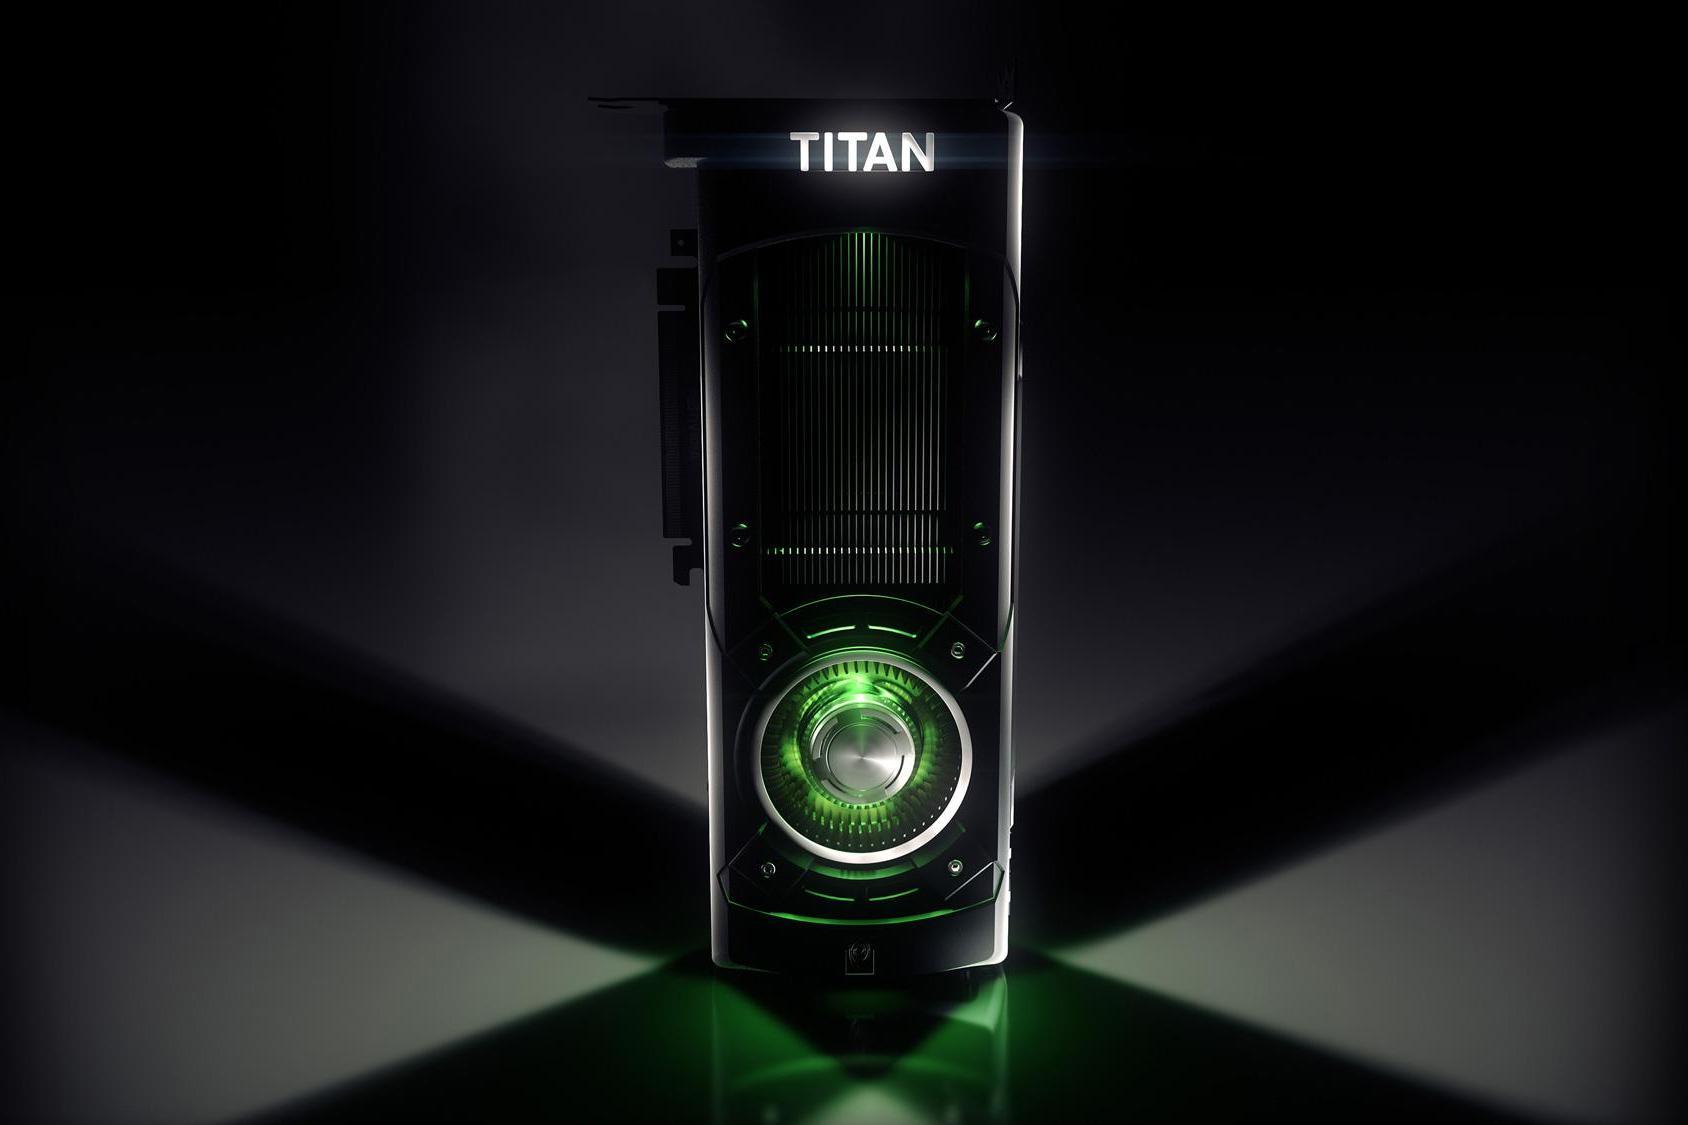 nvidia-titan-x.jpg